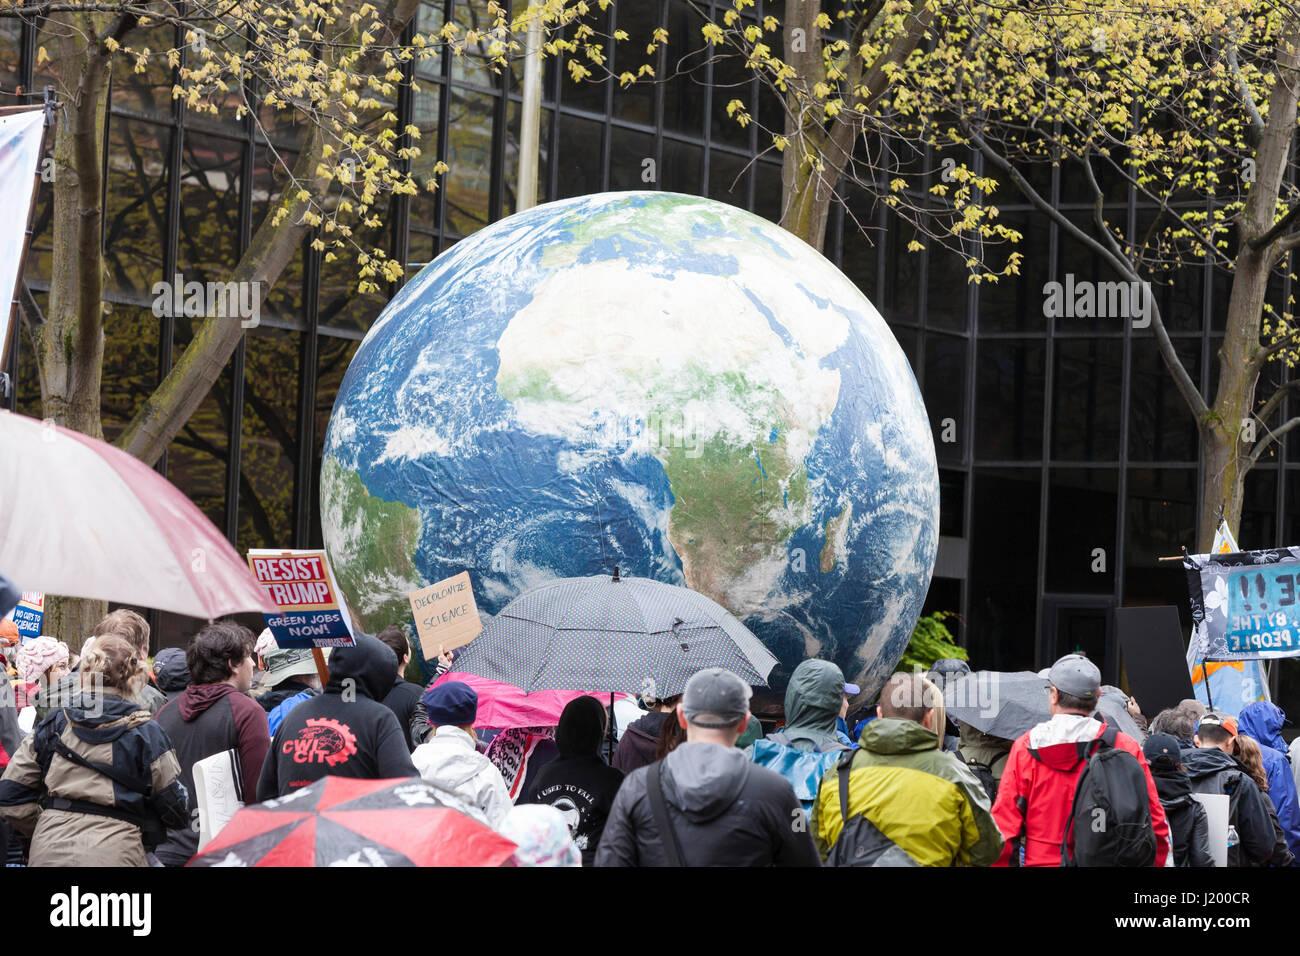 Seattle, Washington,USA. 22nd April, 2017. A large globe makes its way along 4th Avenue on its way to Seattle Center. - Stock Image